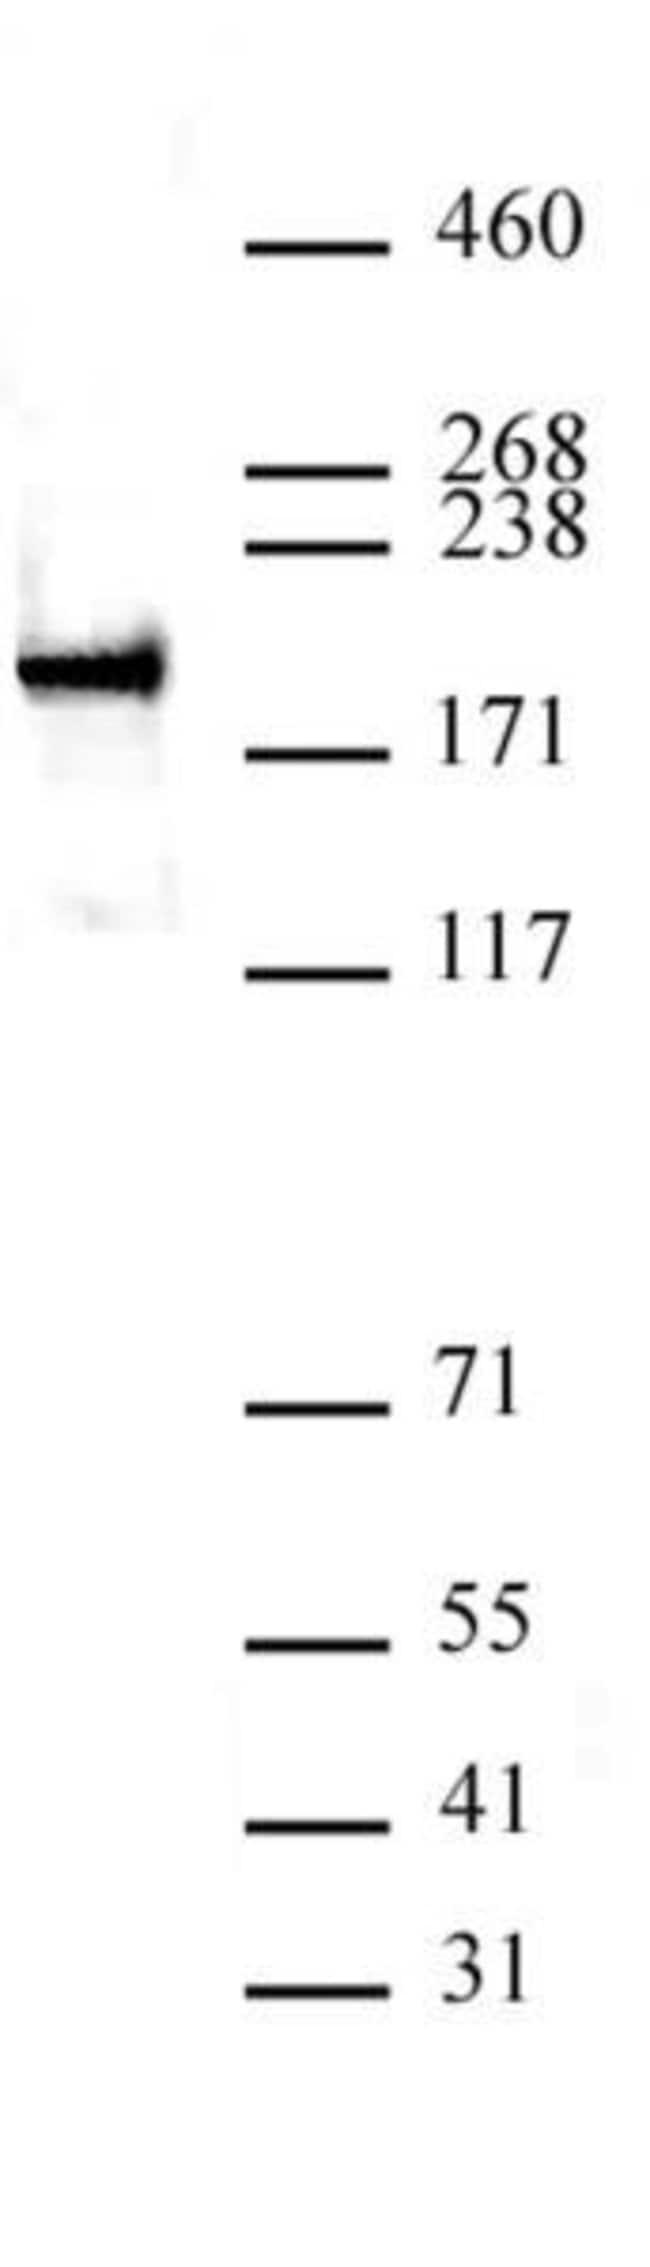 ZEB1 Rabbit anti-Human, Unconjugated, Polyclonal, Active Motif:Antibodies:Primary